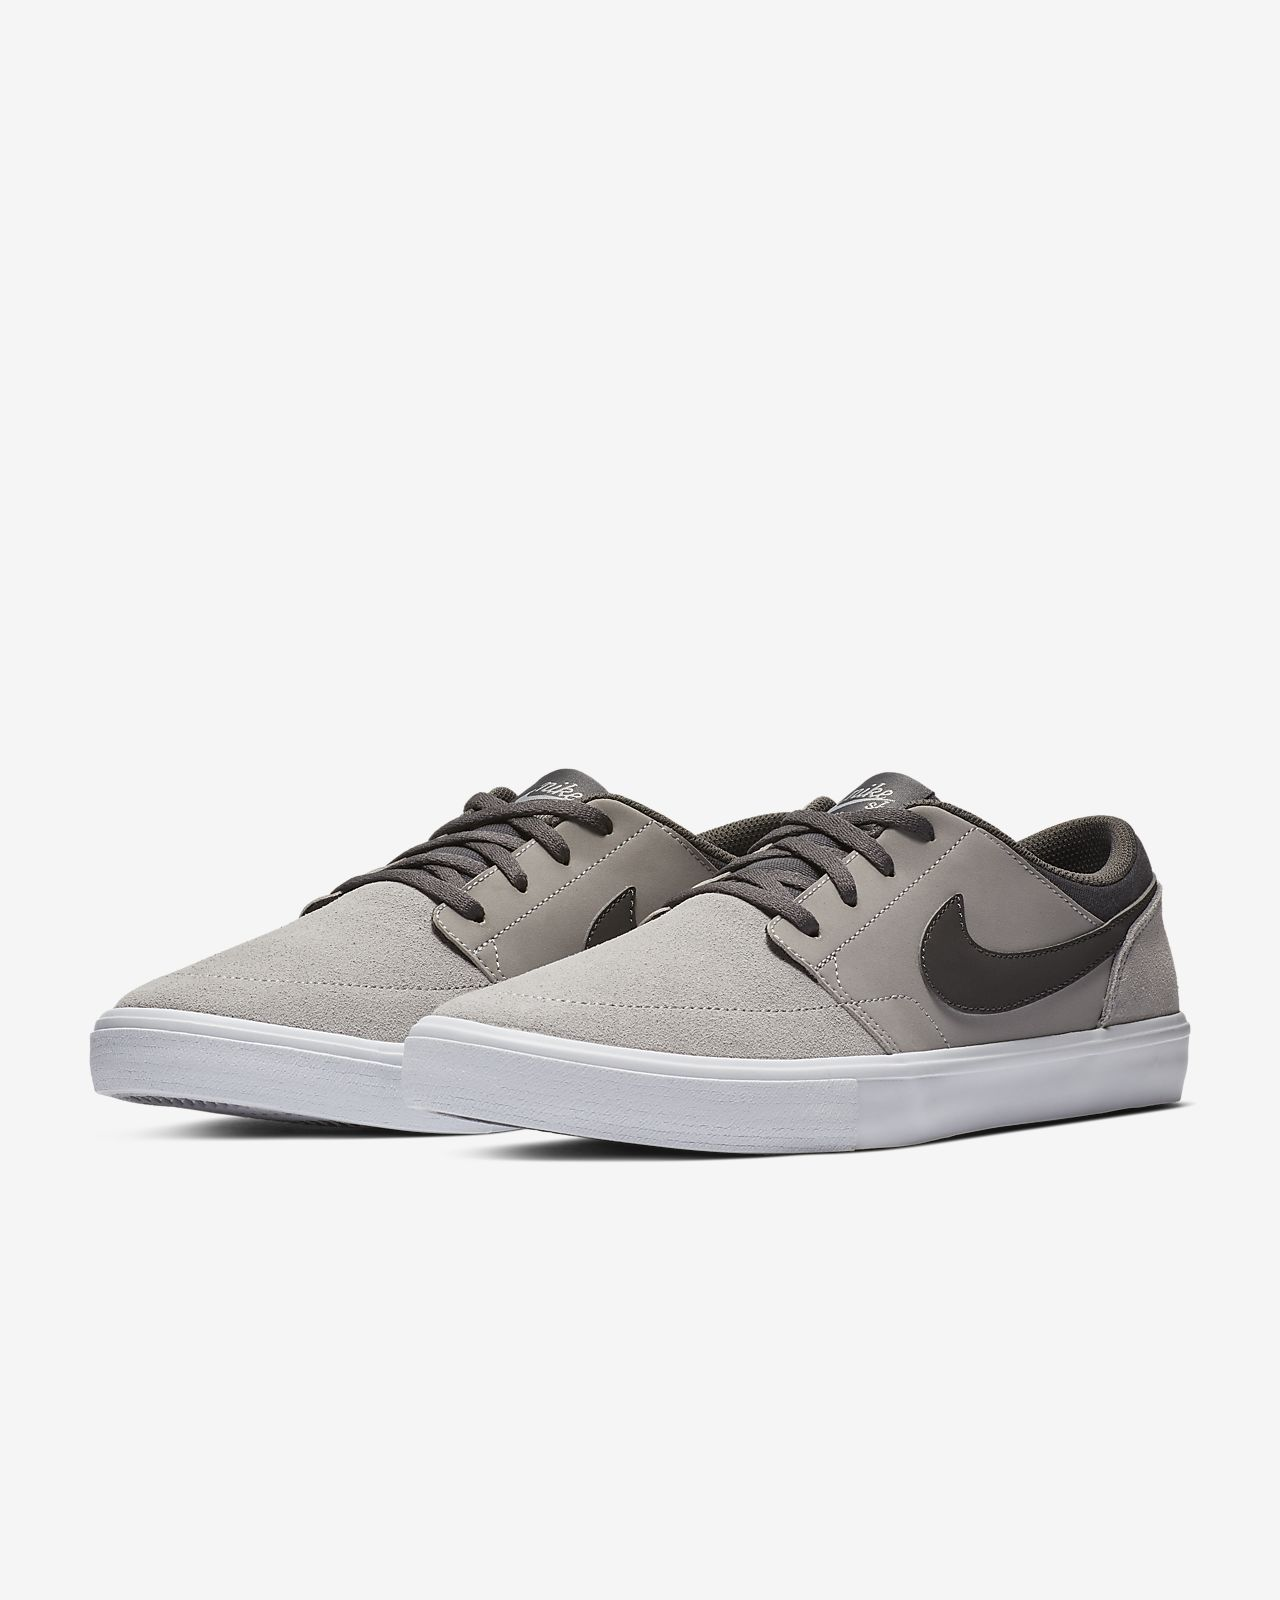 new style 23df1 cddb1 ... Nike SB Solarsoft Portmore II Men s Skateboarding Shoe